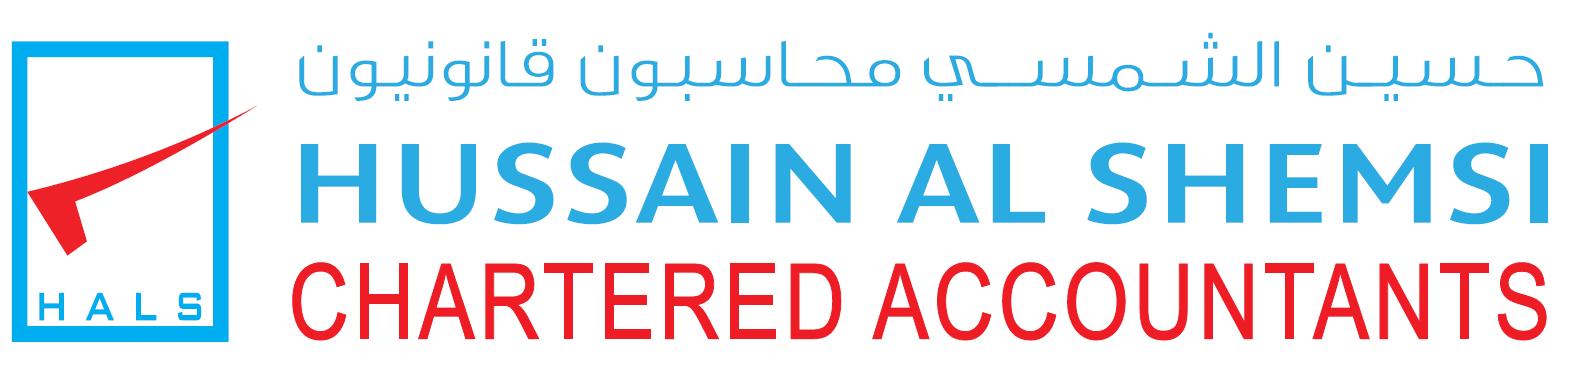 Hussain Al Shemsi Chartered Accountants, Ajman logo